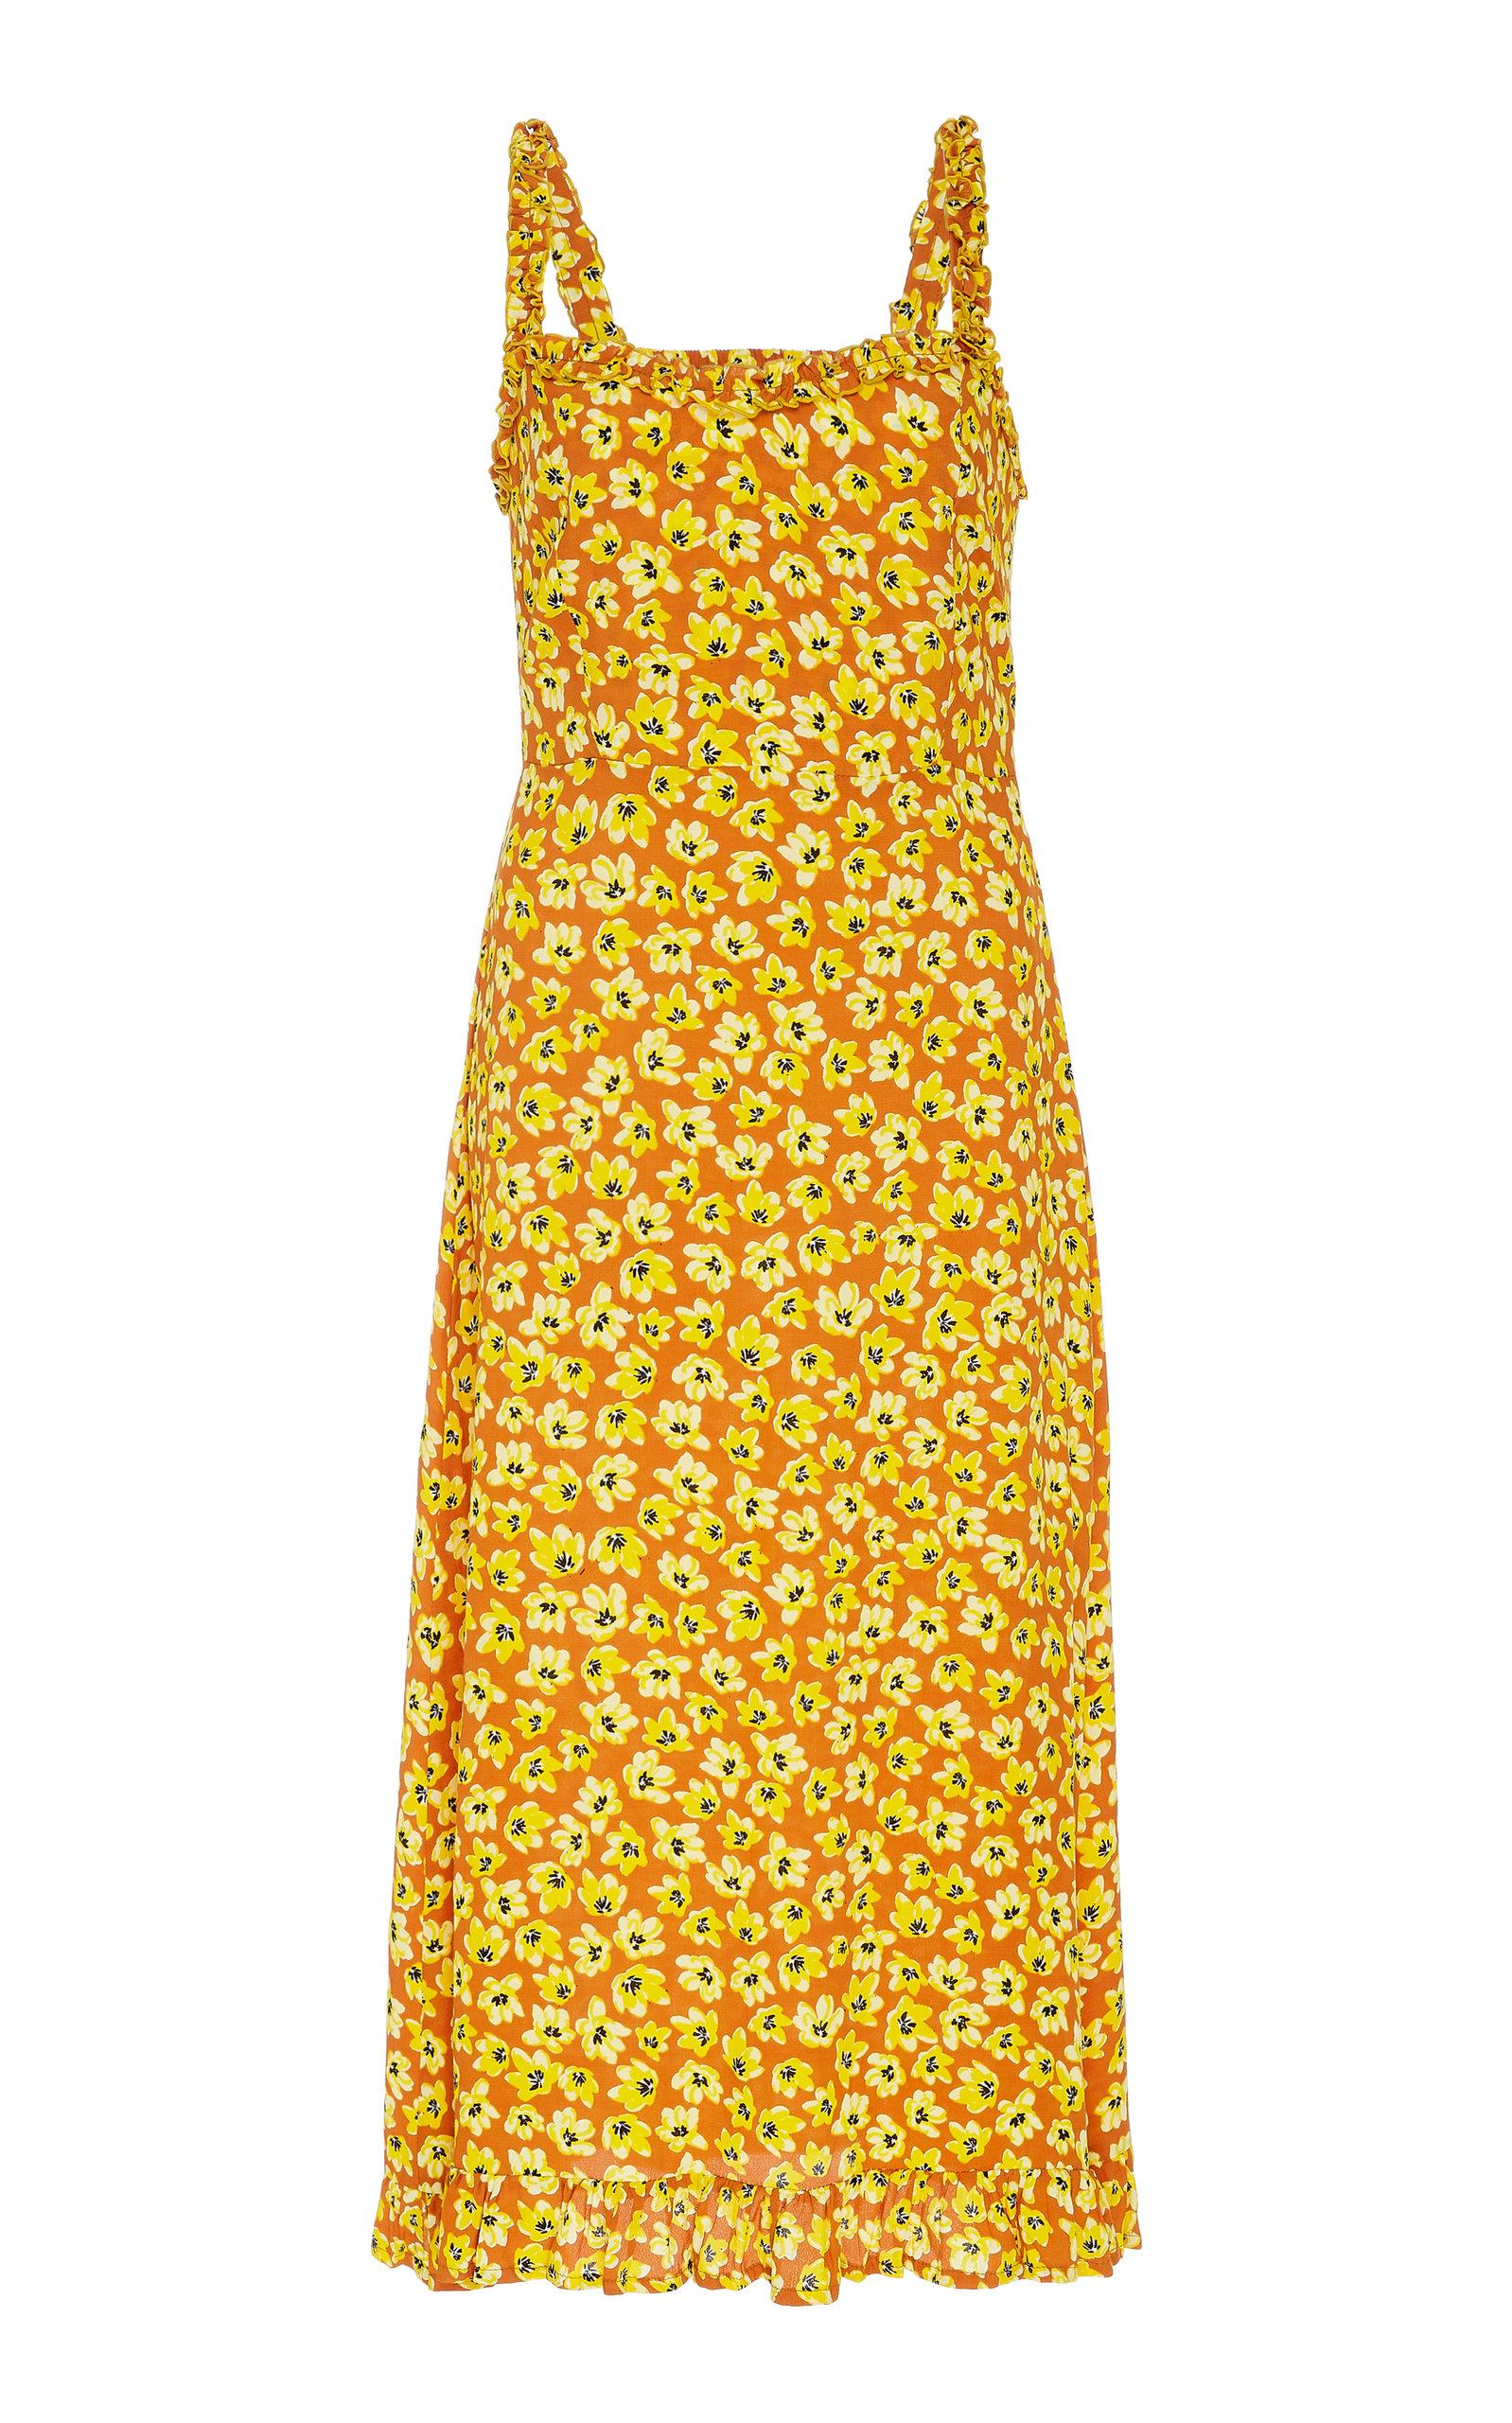 Faithfull The Brand Dresses Noemie Floral-Print Crepe Midi Dress